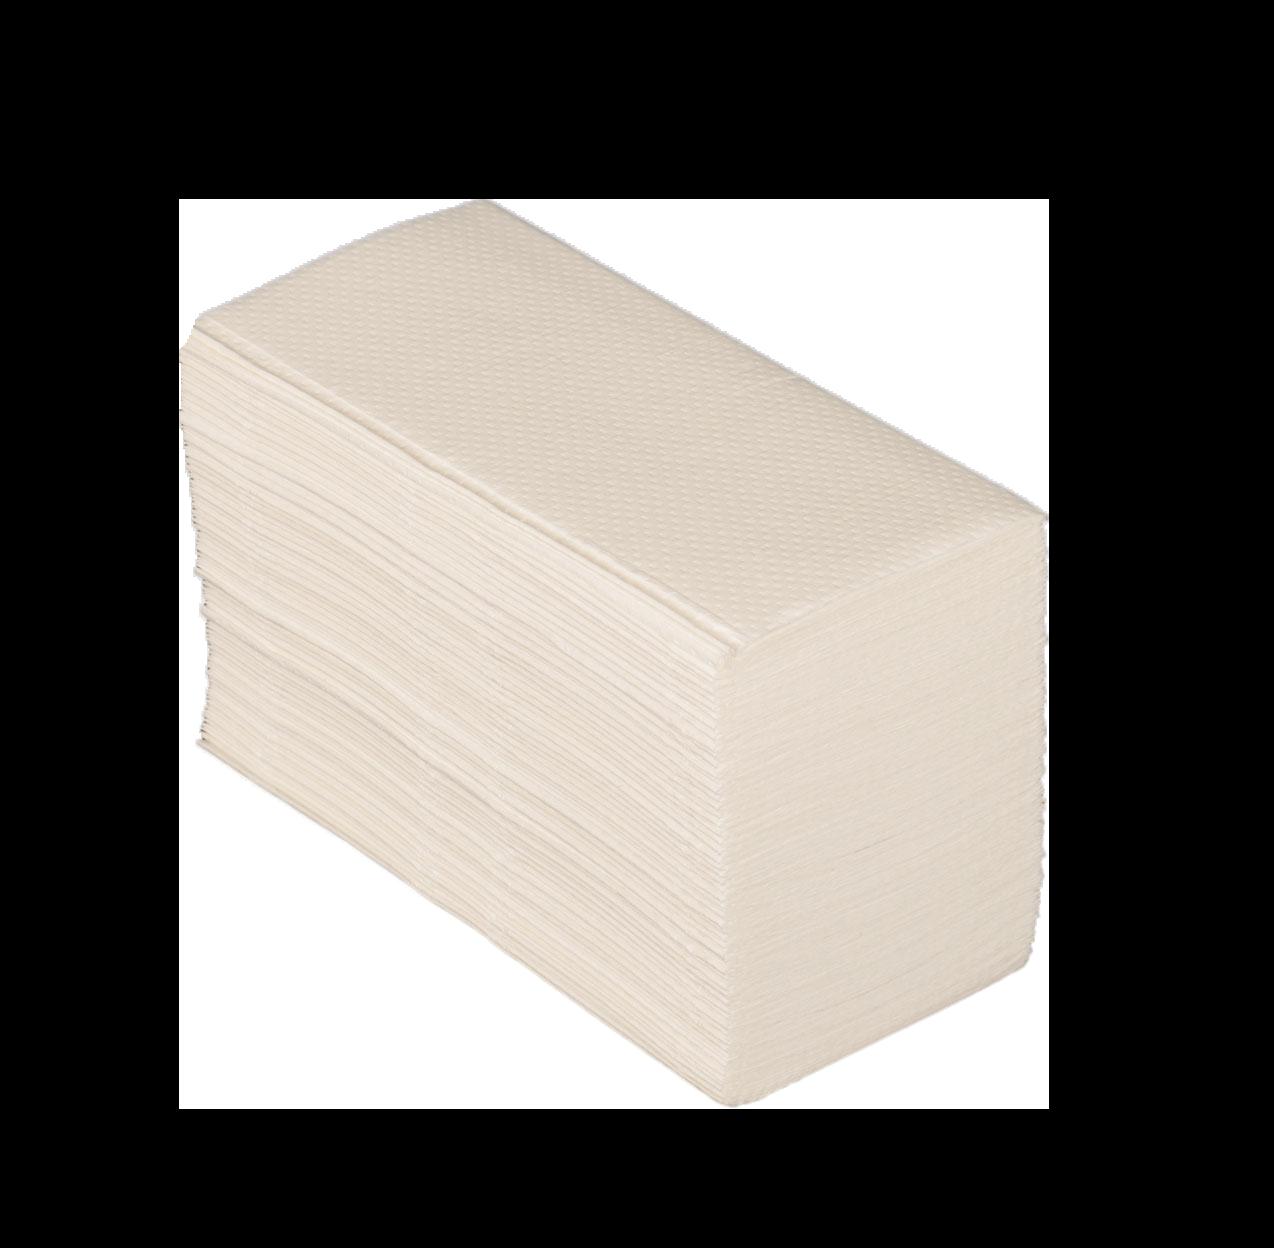 HANDTOWEL - White Vfold 21x22cm (mix.2p)